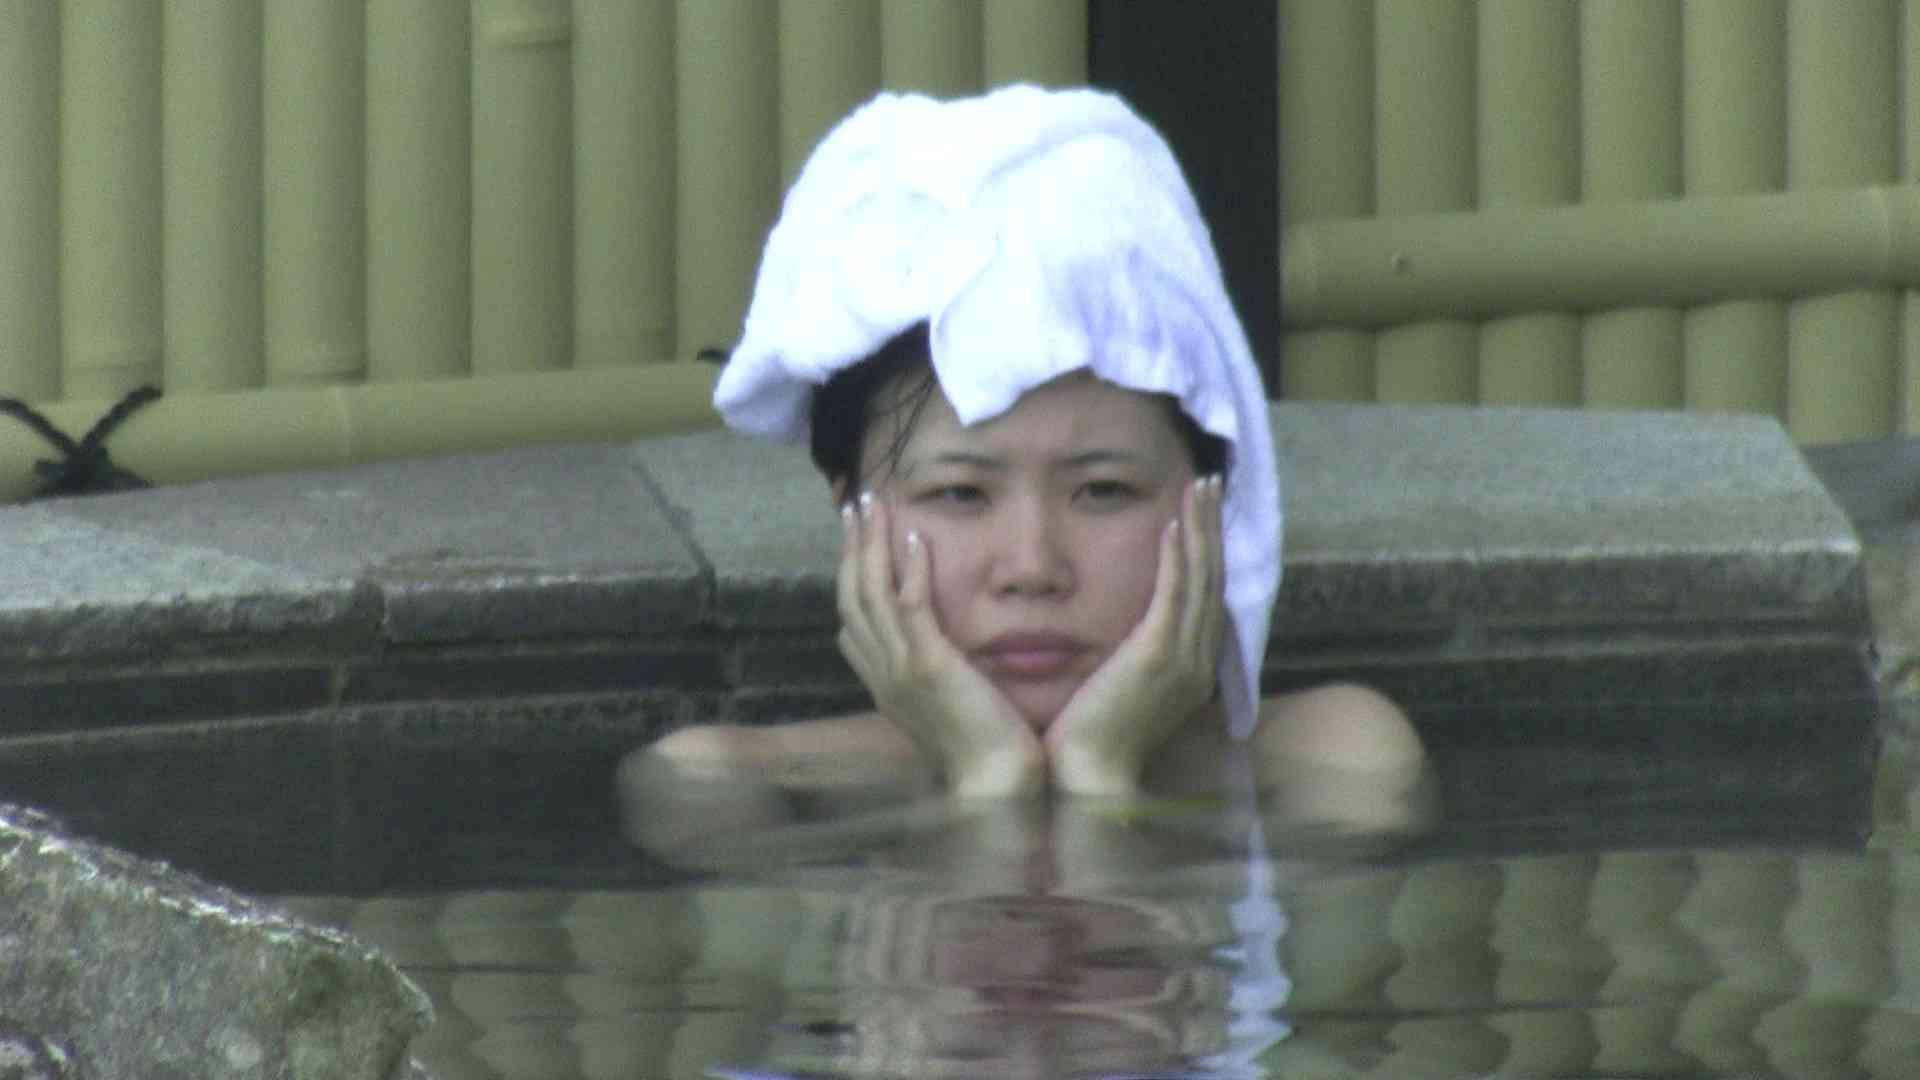 Aquaな露天風呂Vol.183 盗撮師作品 エロ無料画像 105pic 98